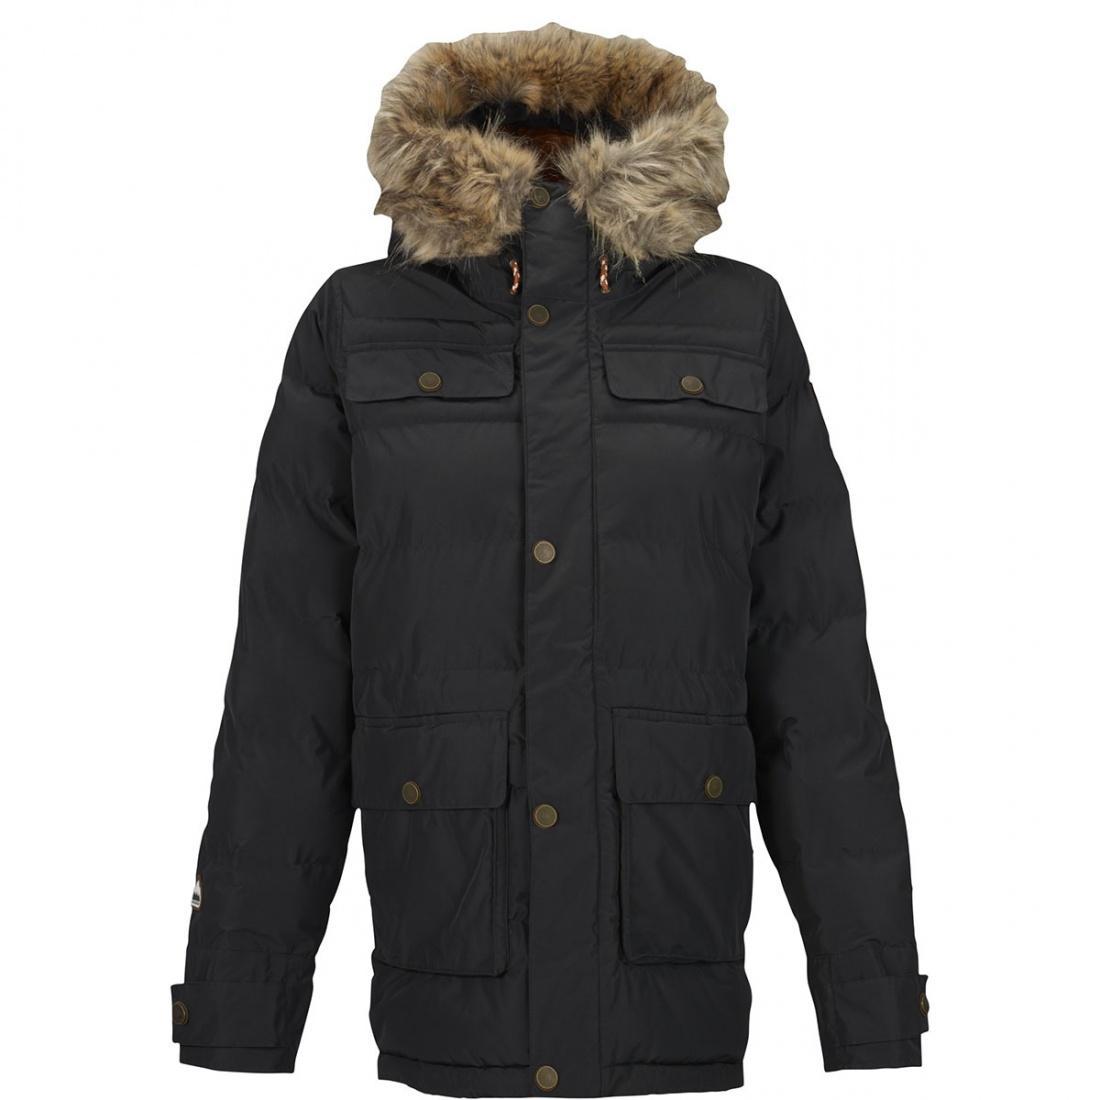 Куртка г/л WB ESSEX PUFFY JKКуртки<br>Удобная мужская куртка<br><br>Мембрана: 10,000mm/ 10,000 g<br>Двухслойный водоотталкивающий материал DRYRIDE Durashell™<br>Утеплитель: bluesign® THERMOLITE® <br>Дышащая подкладка Living Lining™<br>Стандартный крой&lt;...<br><br>Цвет: Черный<br>Размер: S